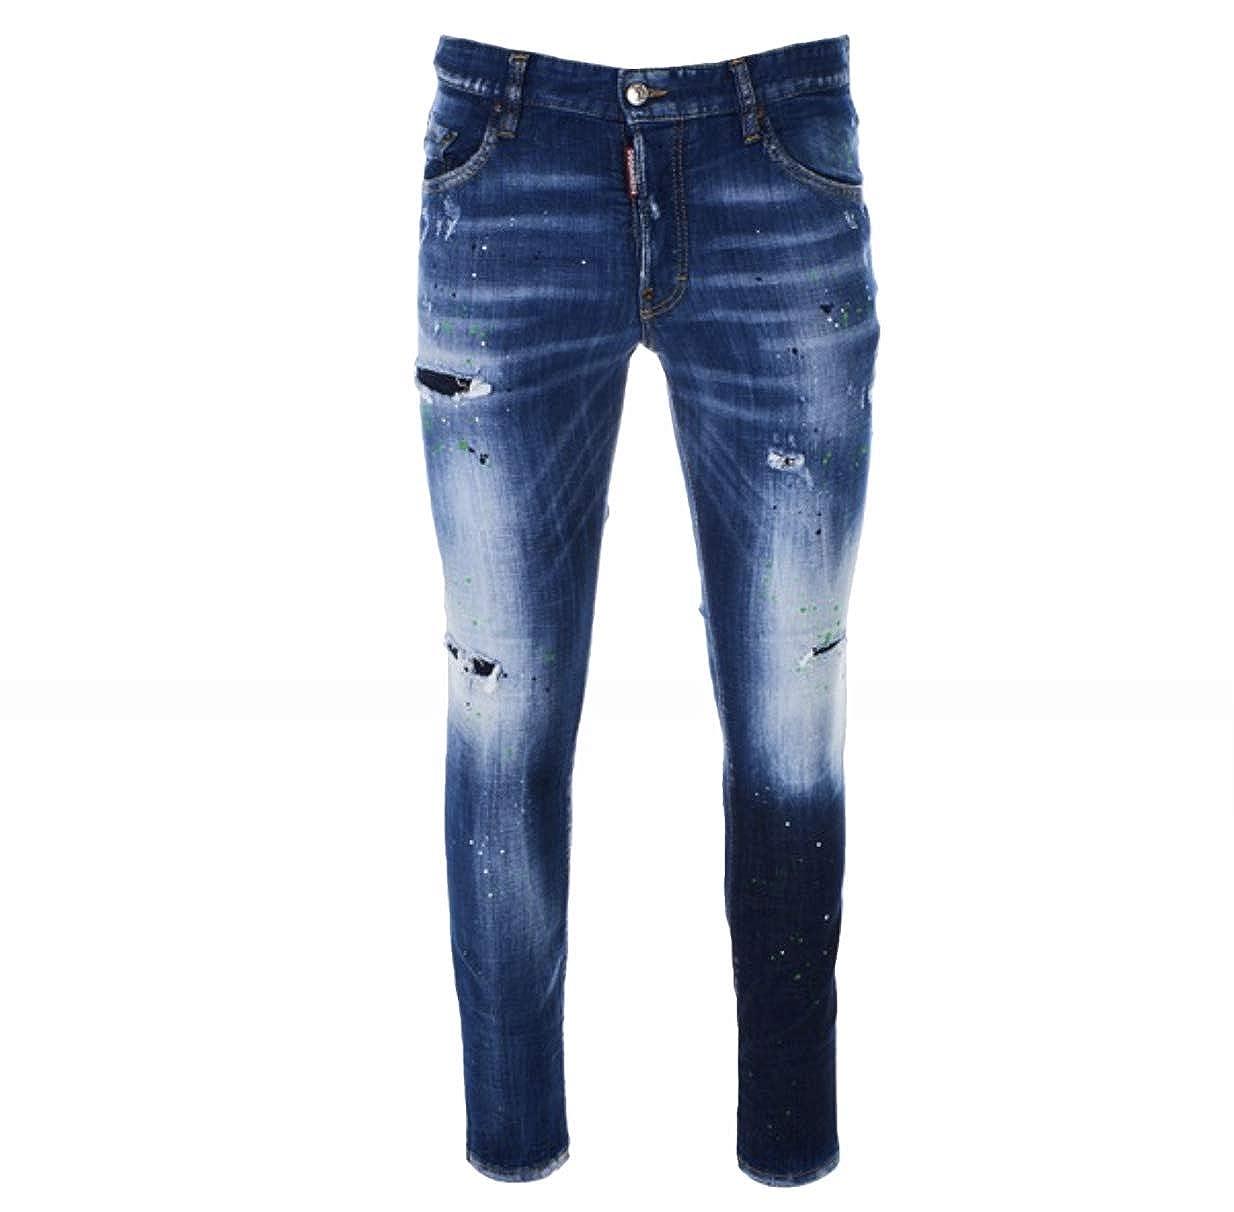 Dsquarosso2 Jeans Skinny Jean Jean Skinny c74d8d - inetlimited.com 117aa77b8e3